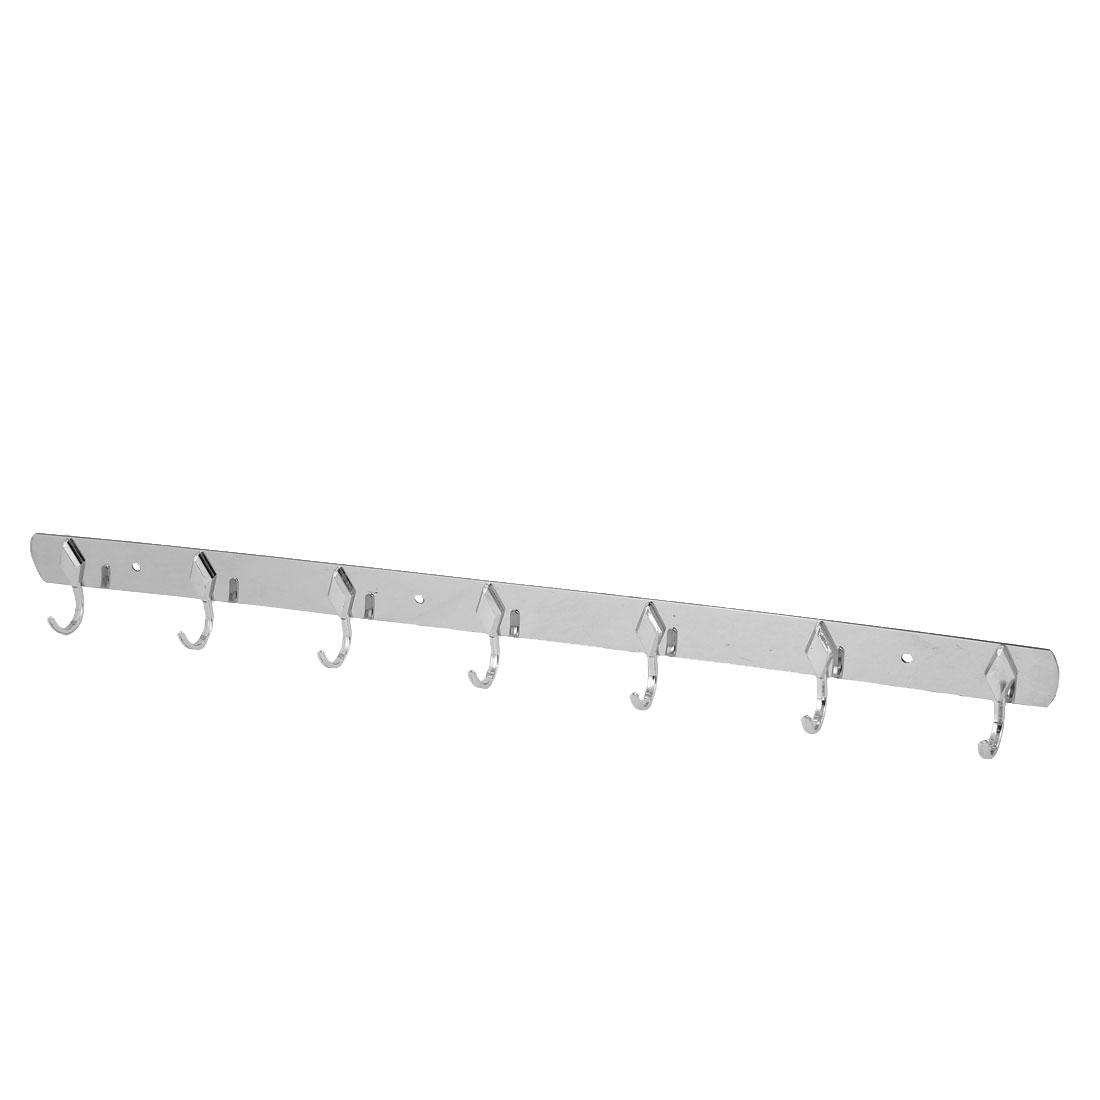 Bathroom Wardrobe Clothes Towel Bag 7 Hooks Stainless Steel Wall Hanging Hook